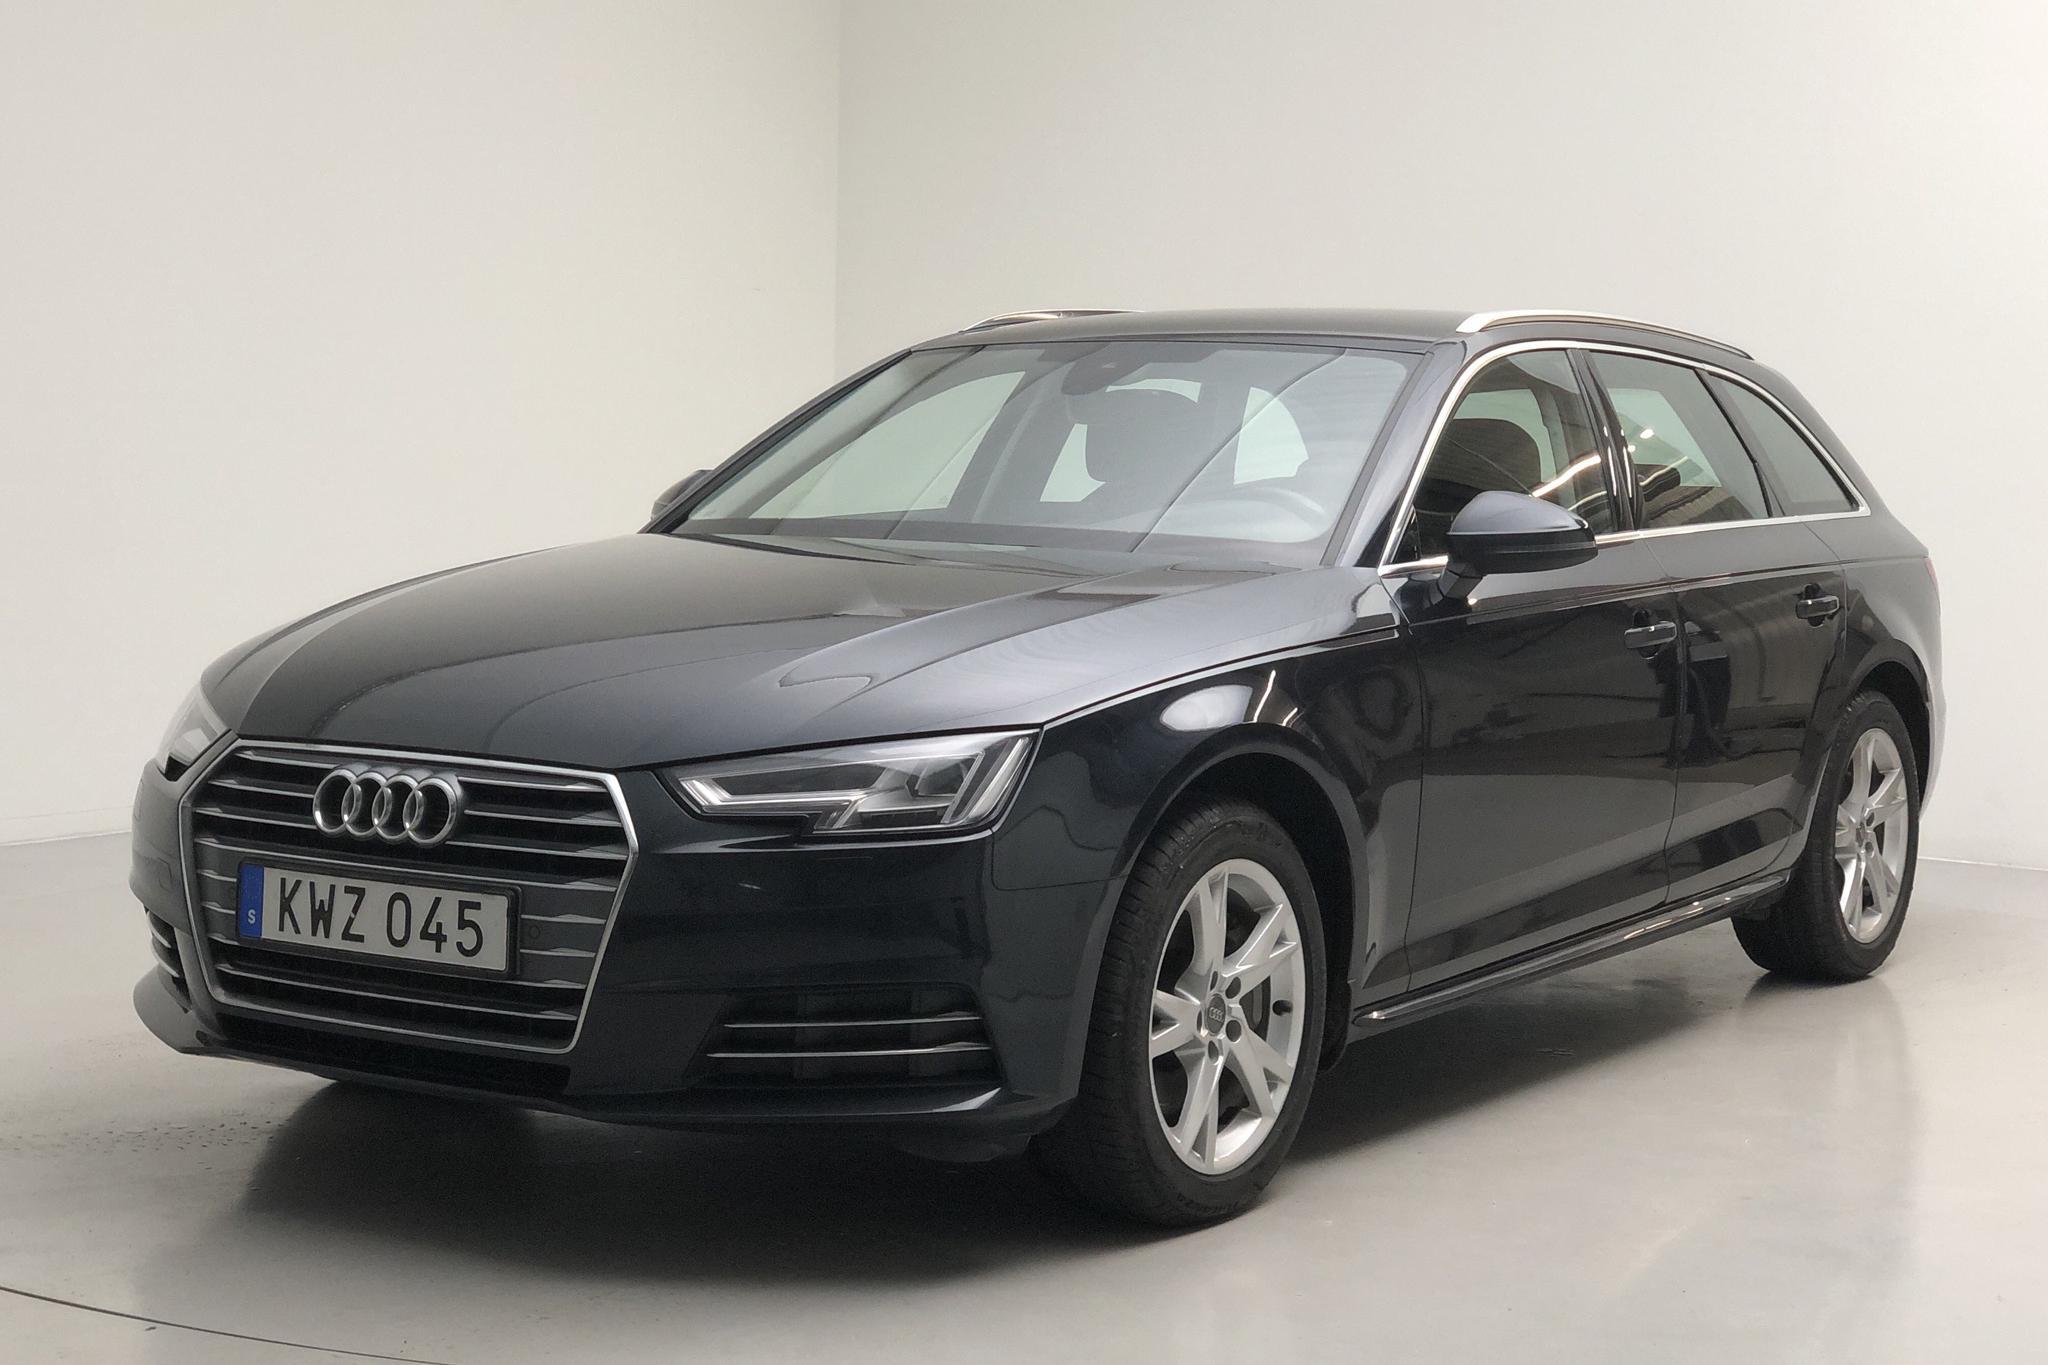 Audi A4 2.0 TDI Avant (190hk) - 129 290 km - Automatic - blue - 2018